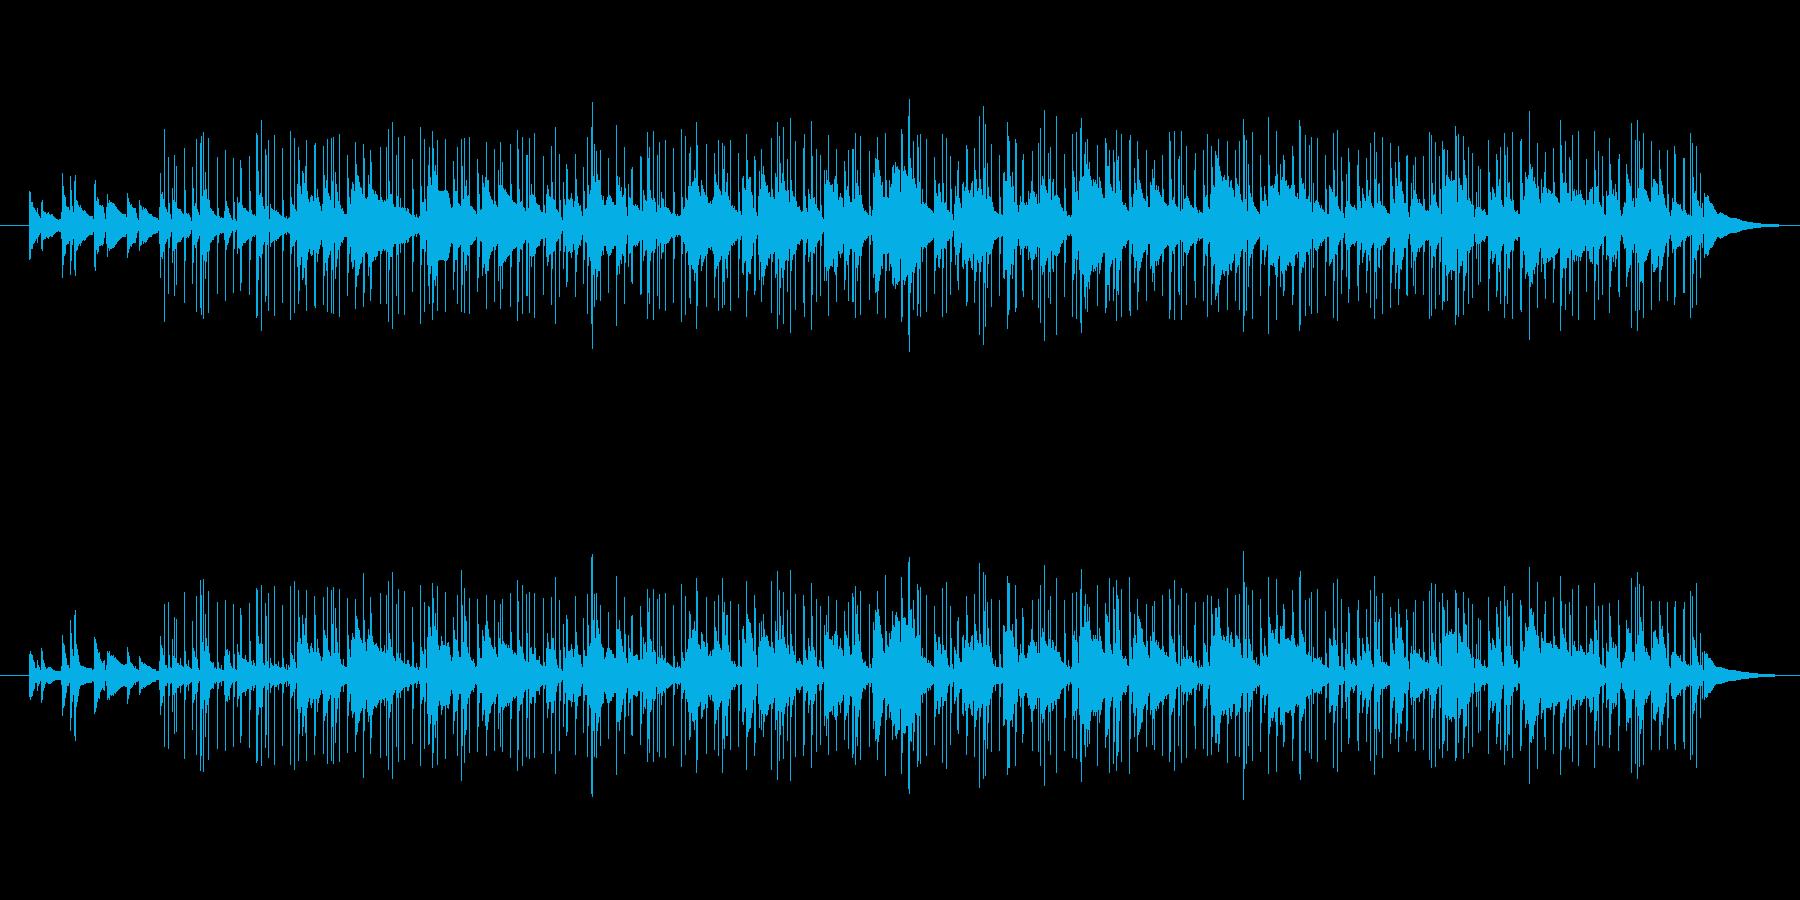 ma-ko song1の再生済みの波形